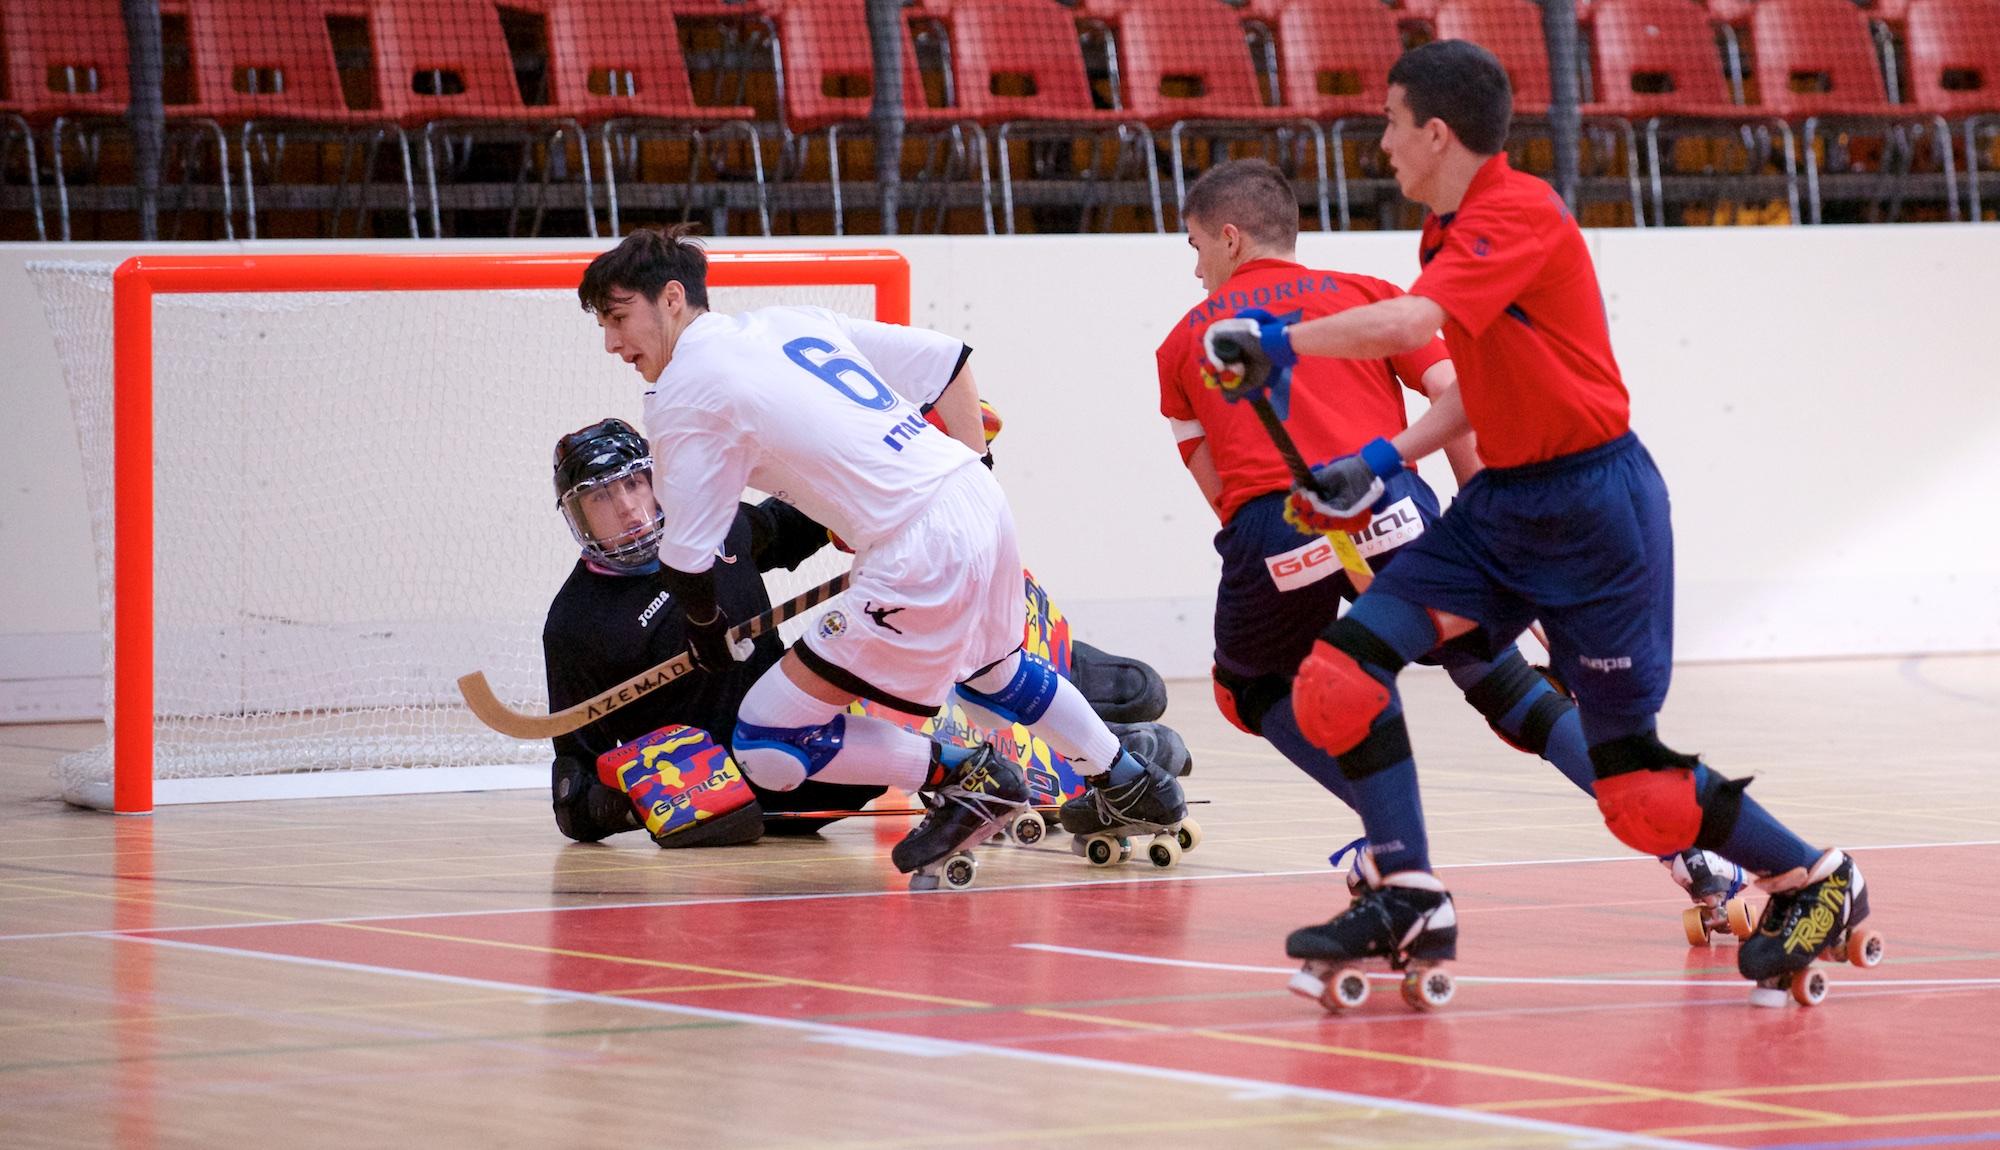 Gavioli (Cgc) in gol agli Europei Under 20 di hockey